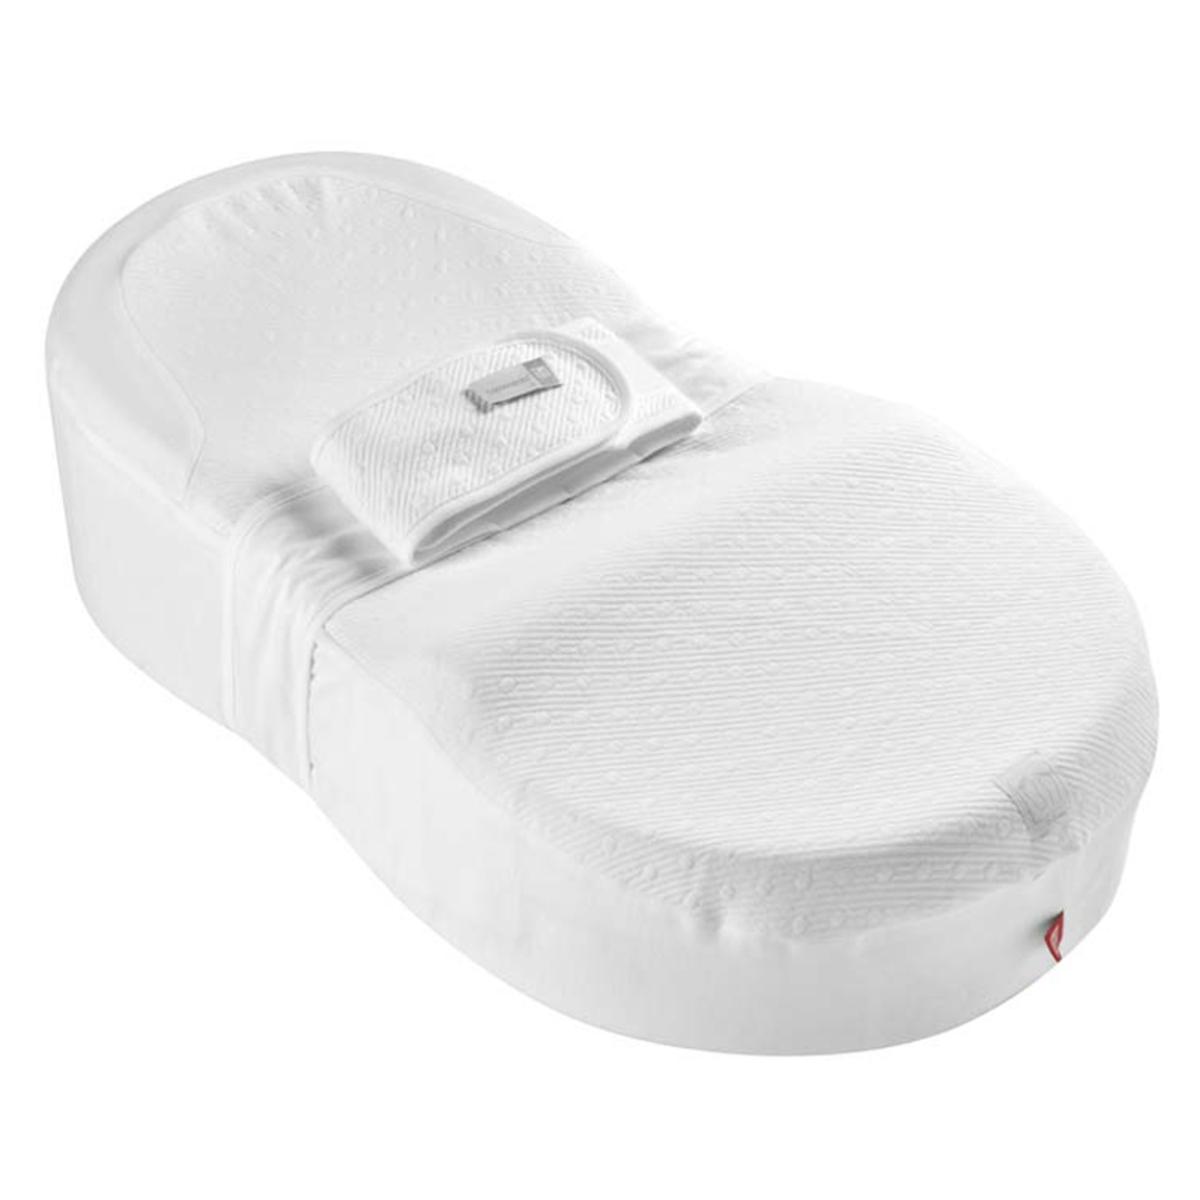 Inclinateur Cocoonababy + Drap Bulle de Coton - Blanc Cocoonababy + Drap Bulle de Coton - Blanc